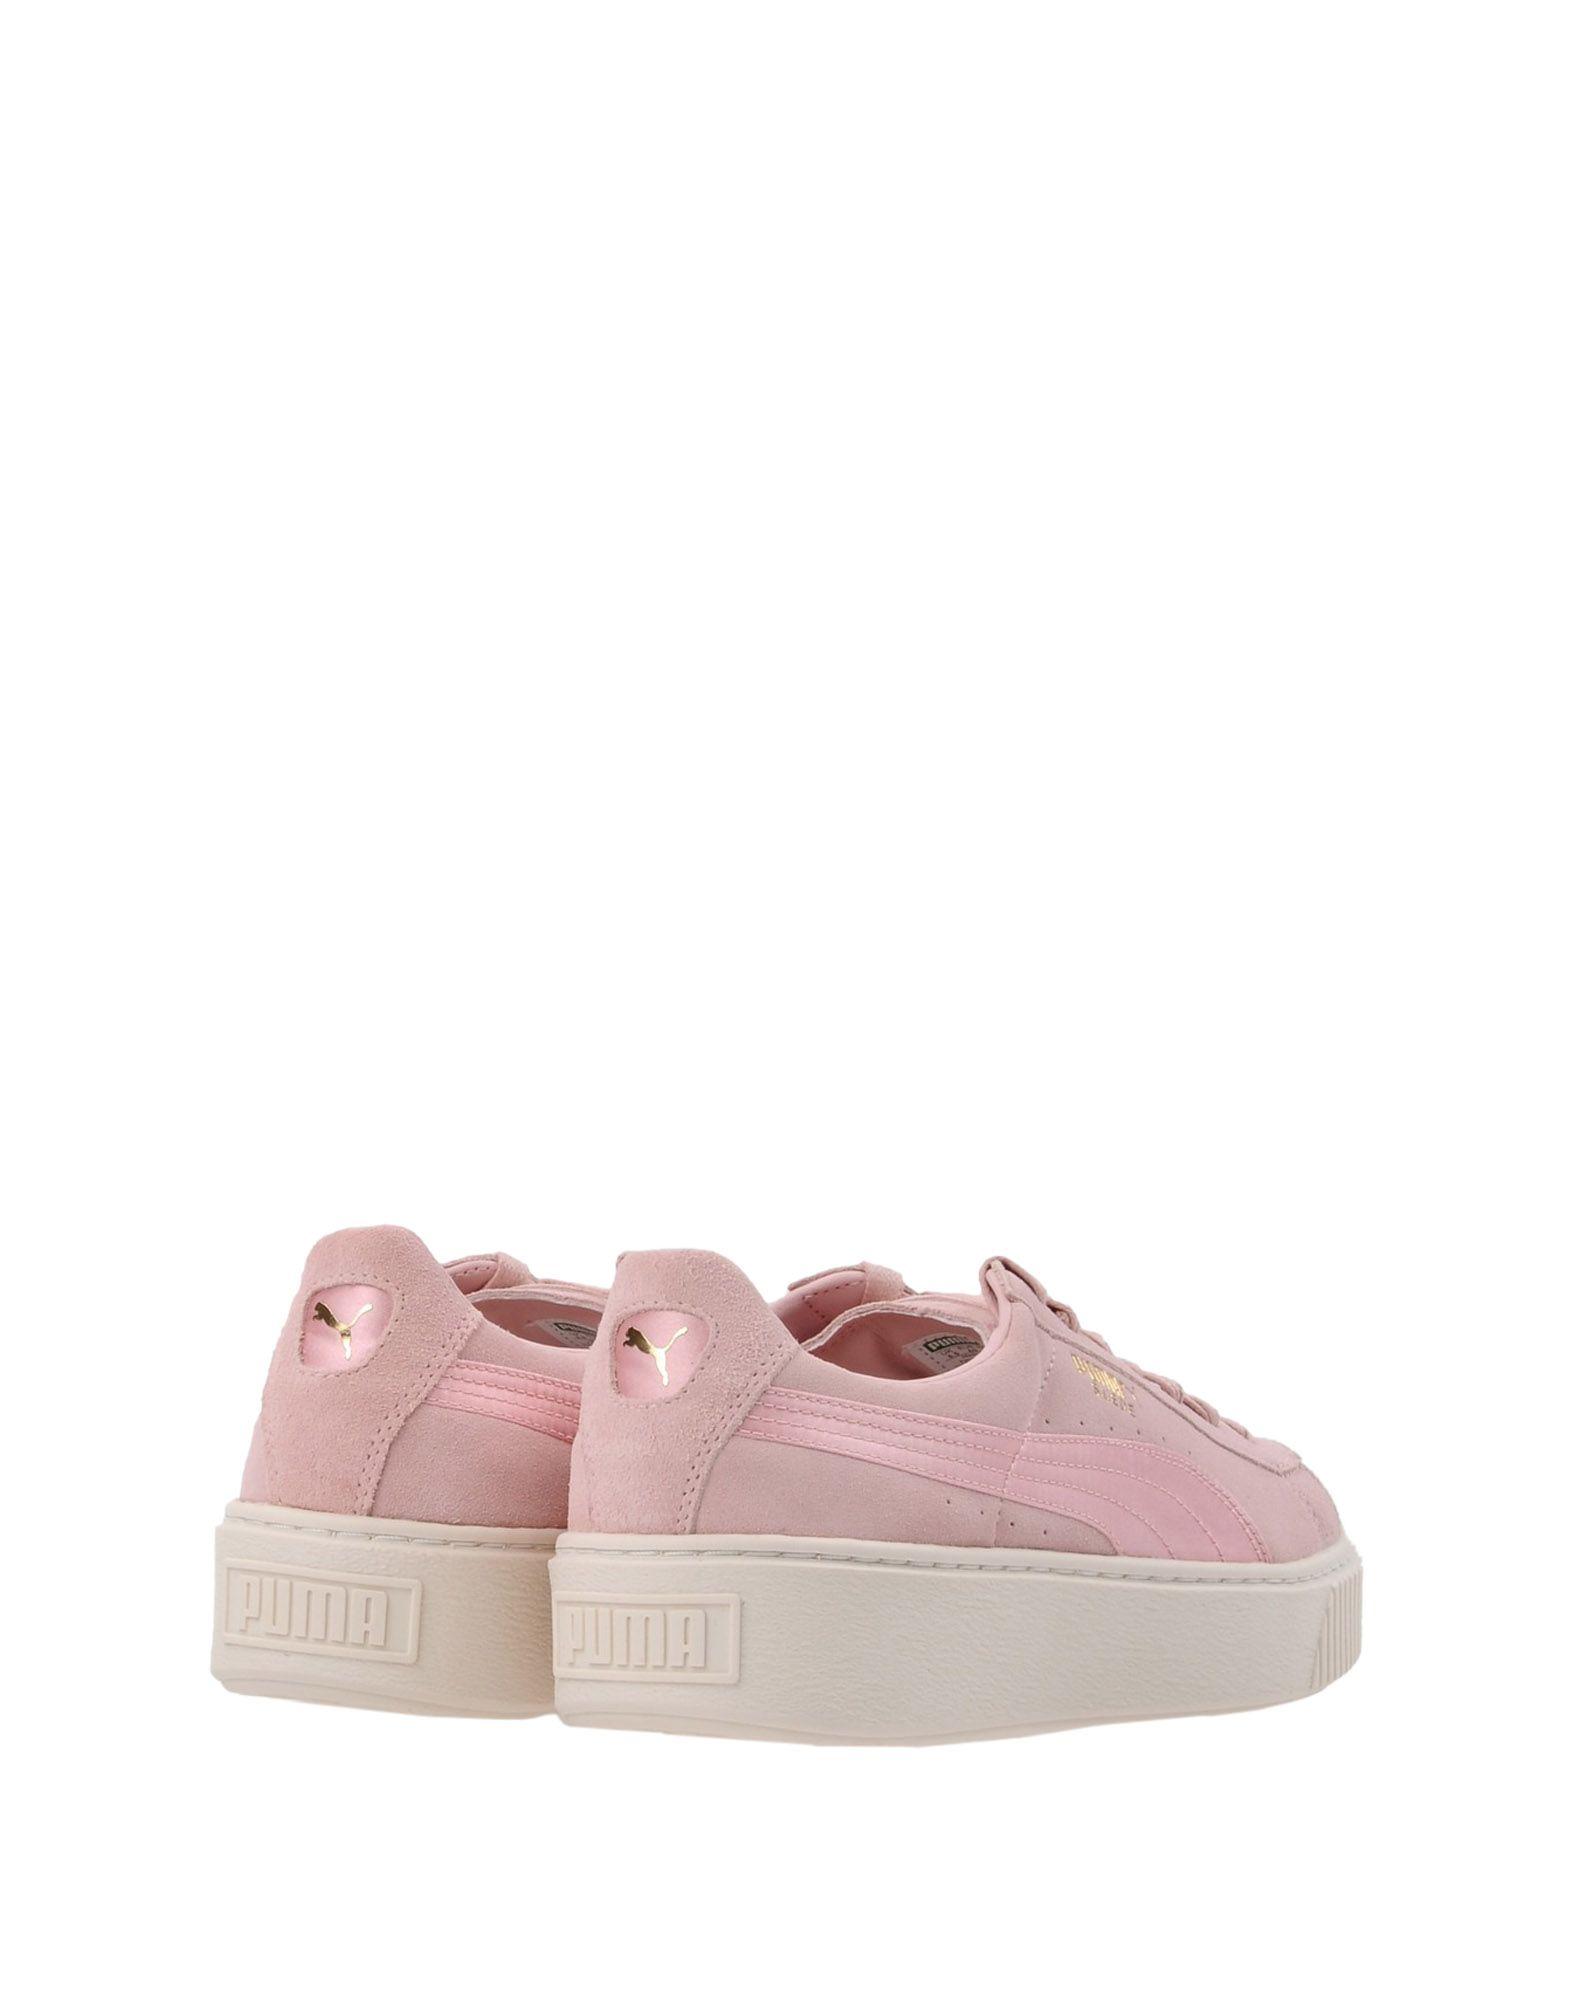 Sneakers Puma Suede Platform Satin - Femme - Sneakers Puma sur